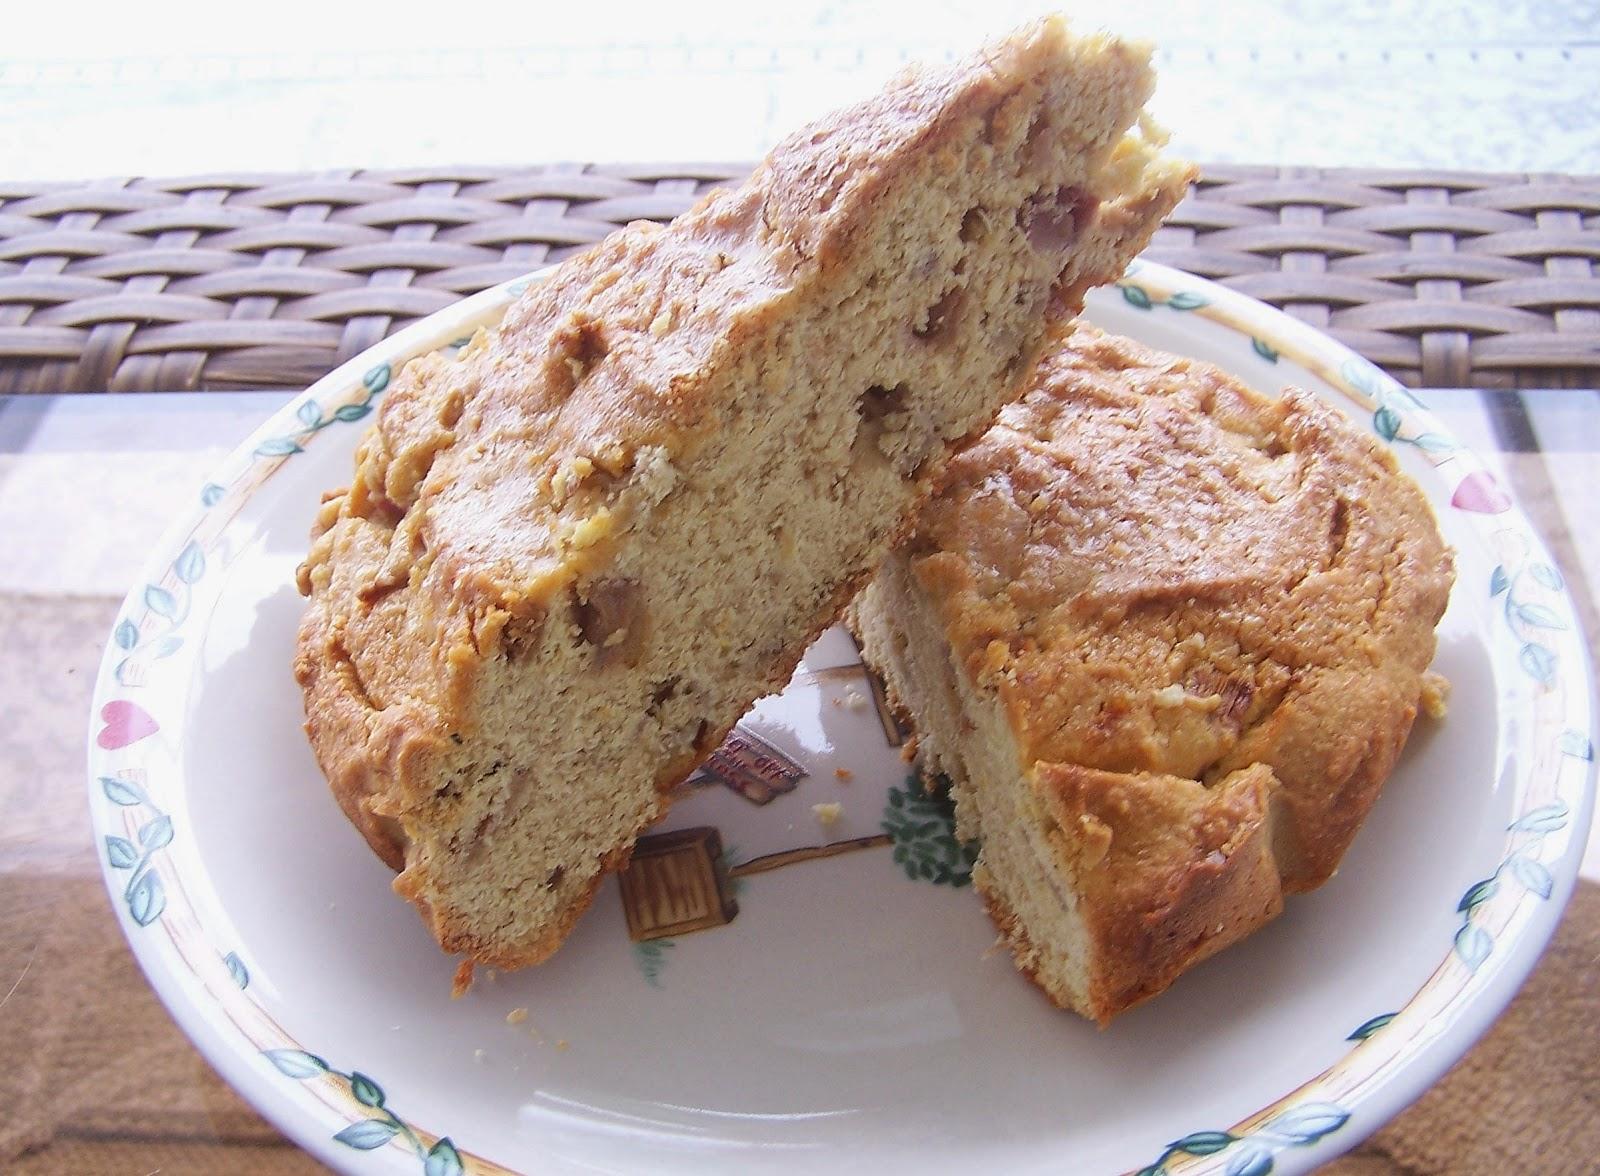 Skinny Ginger Rhubarb Cake, gluten free, grain free